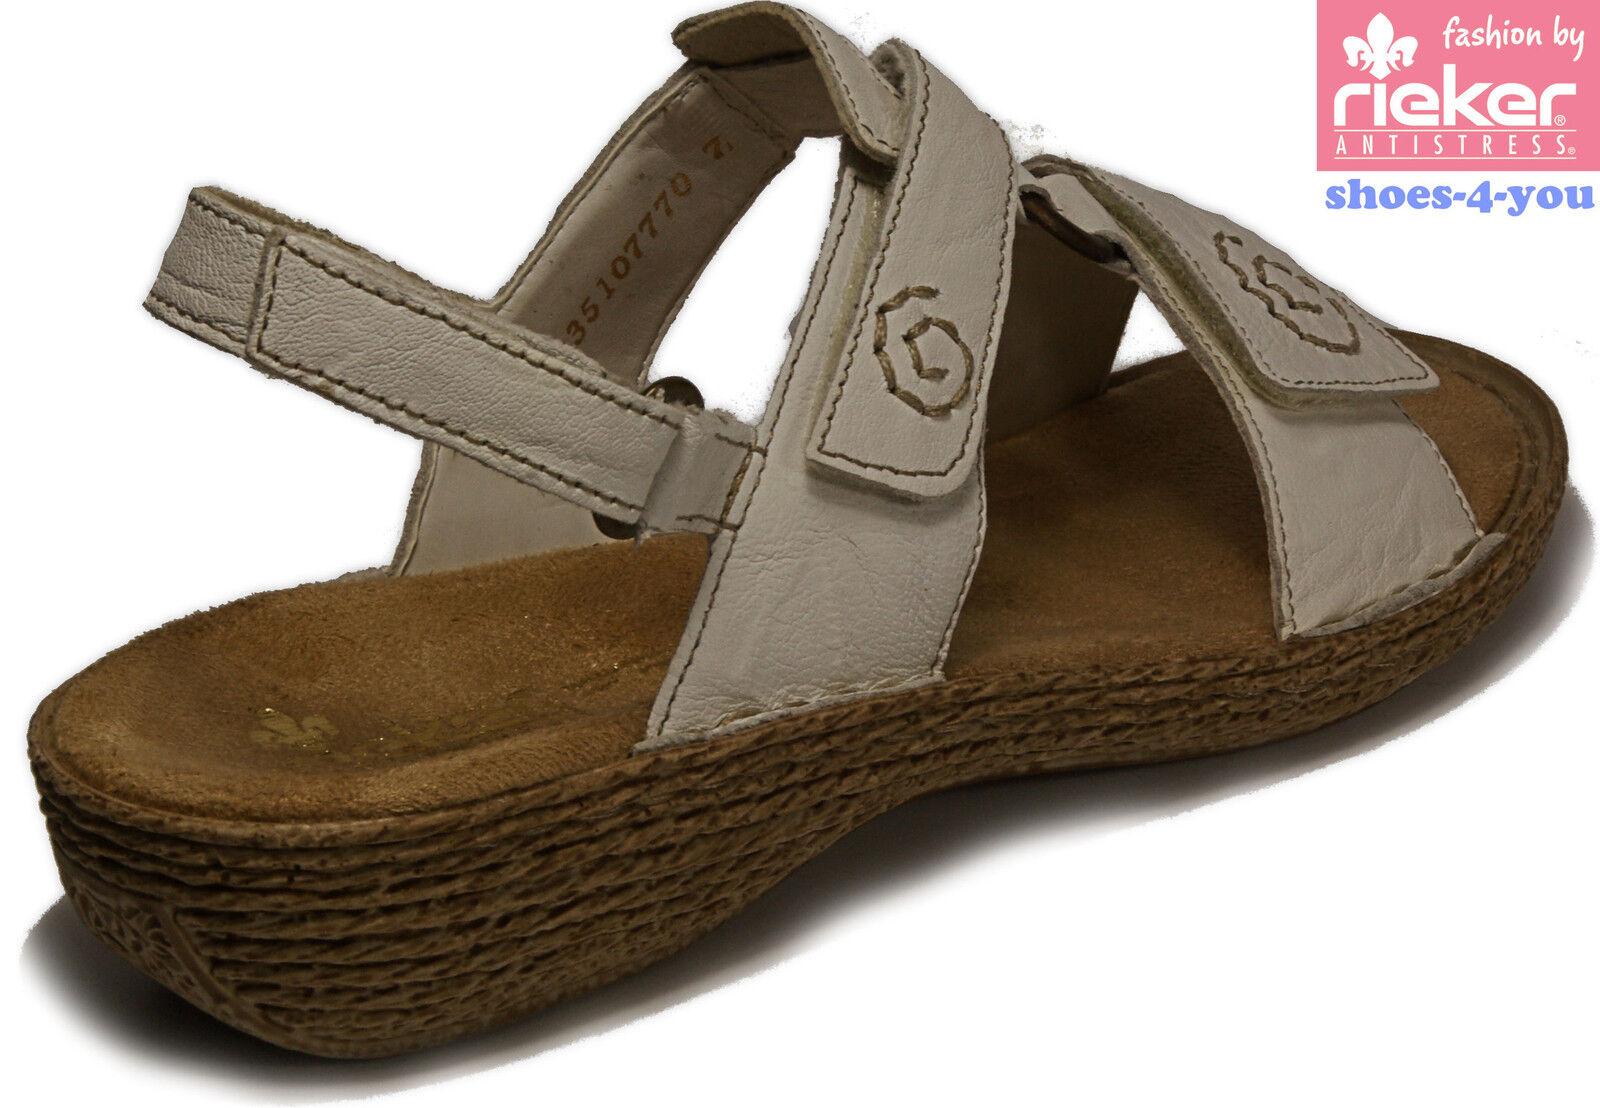 RIEKER Schuhe Sandalen Sandaletten weiß Keilsohle Keilsohle Keilsohle Plateau echt Leder NEU ed2219